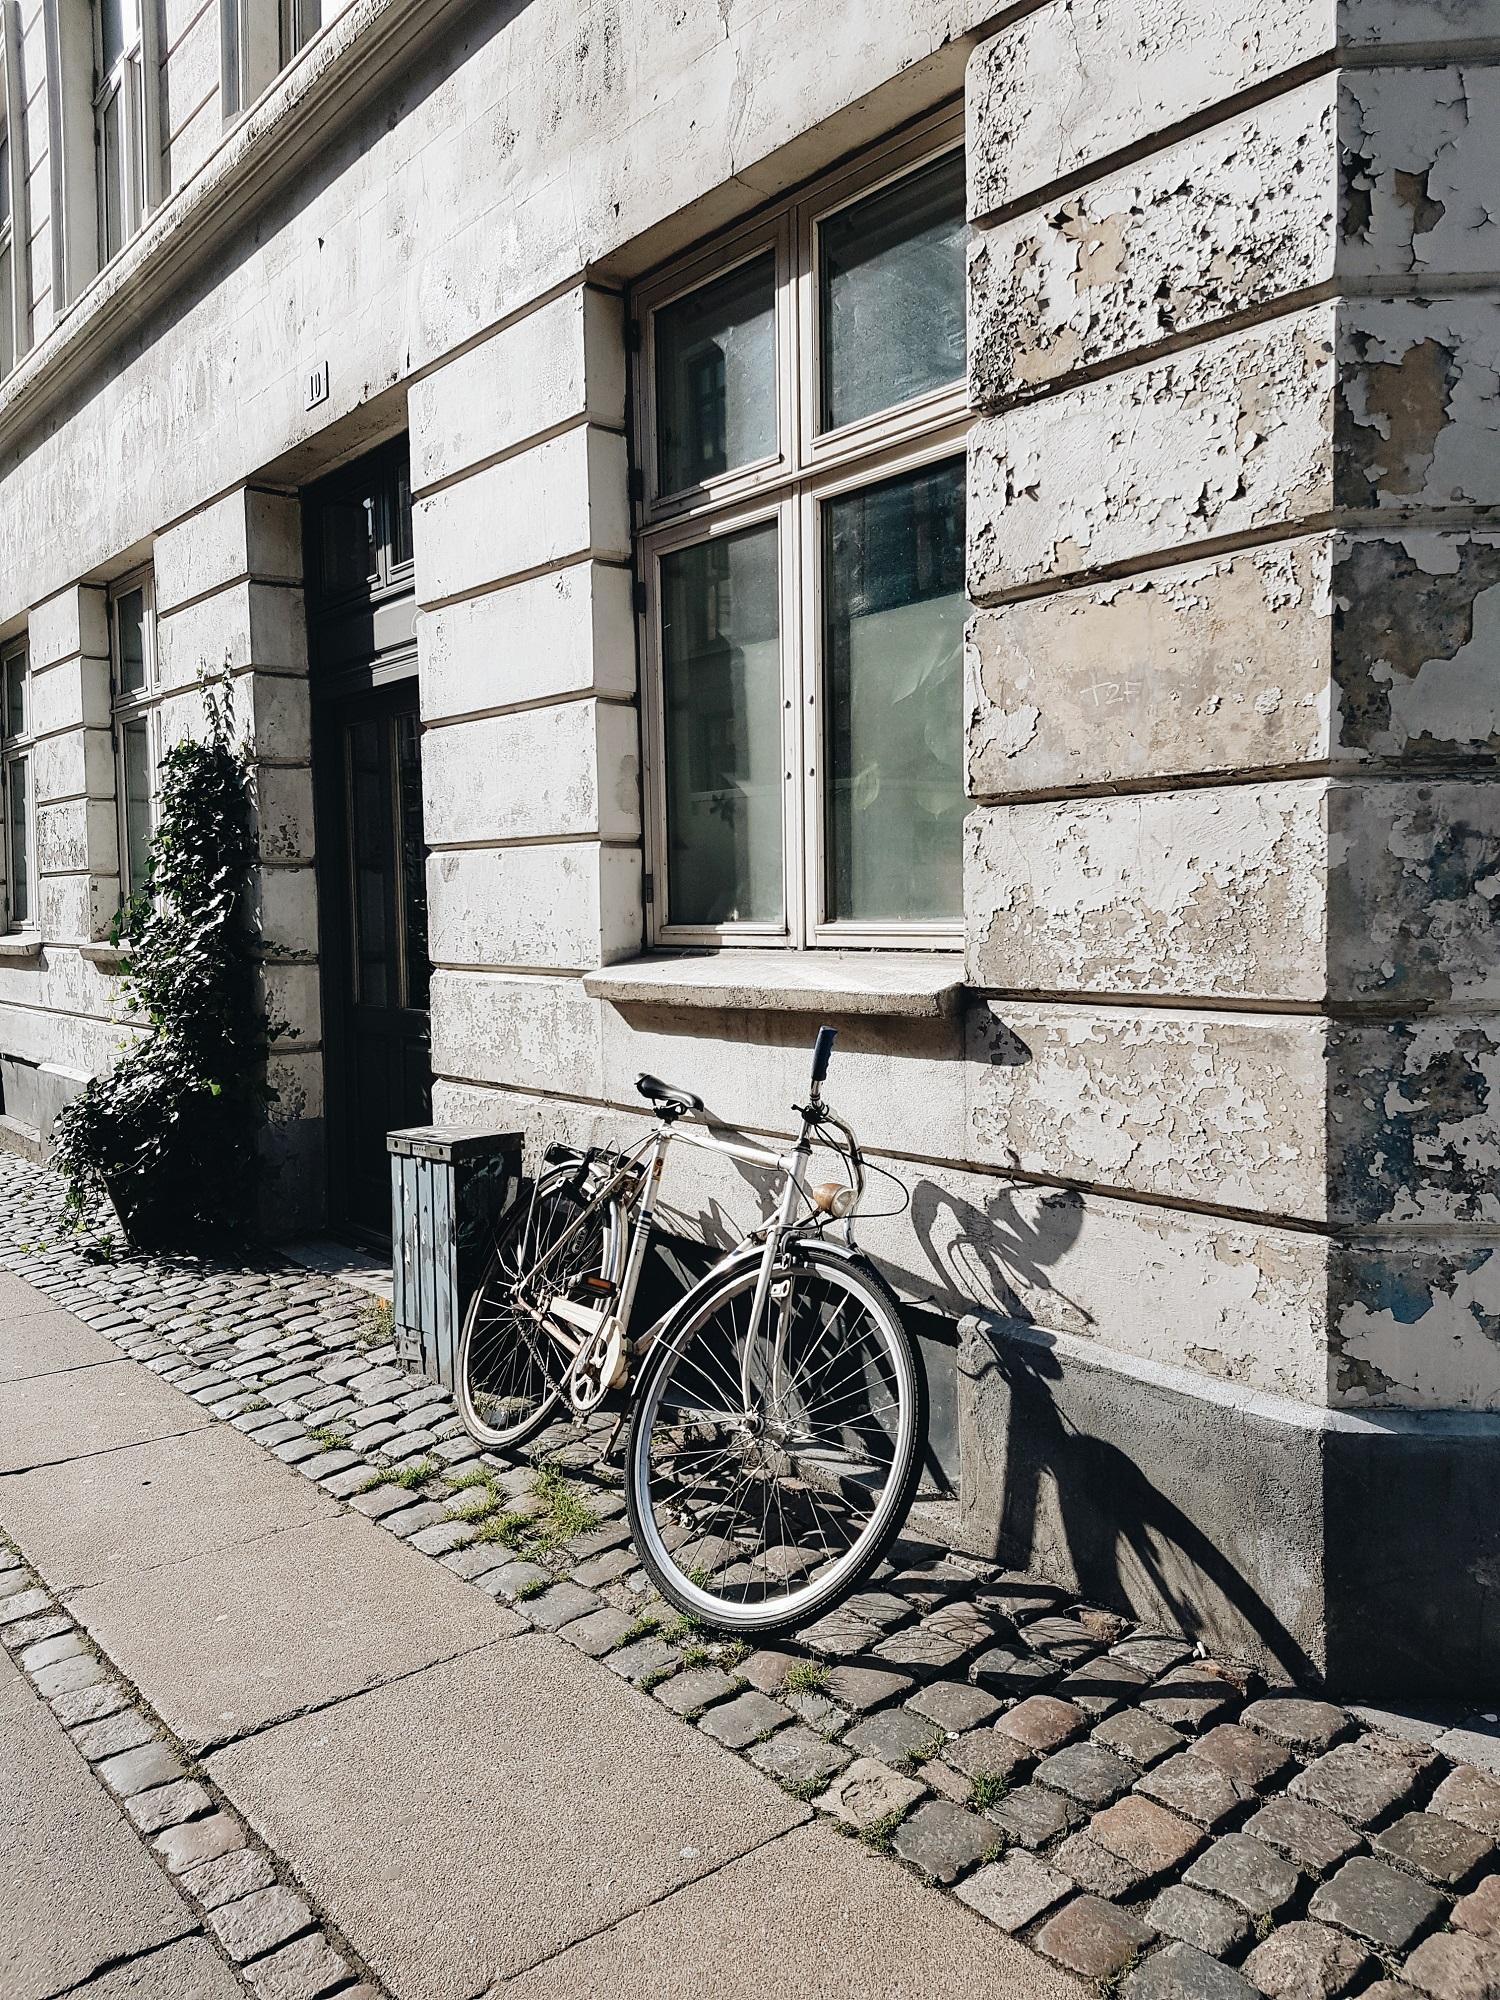 copenhague arquitectura Viajar Inspira